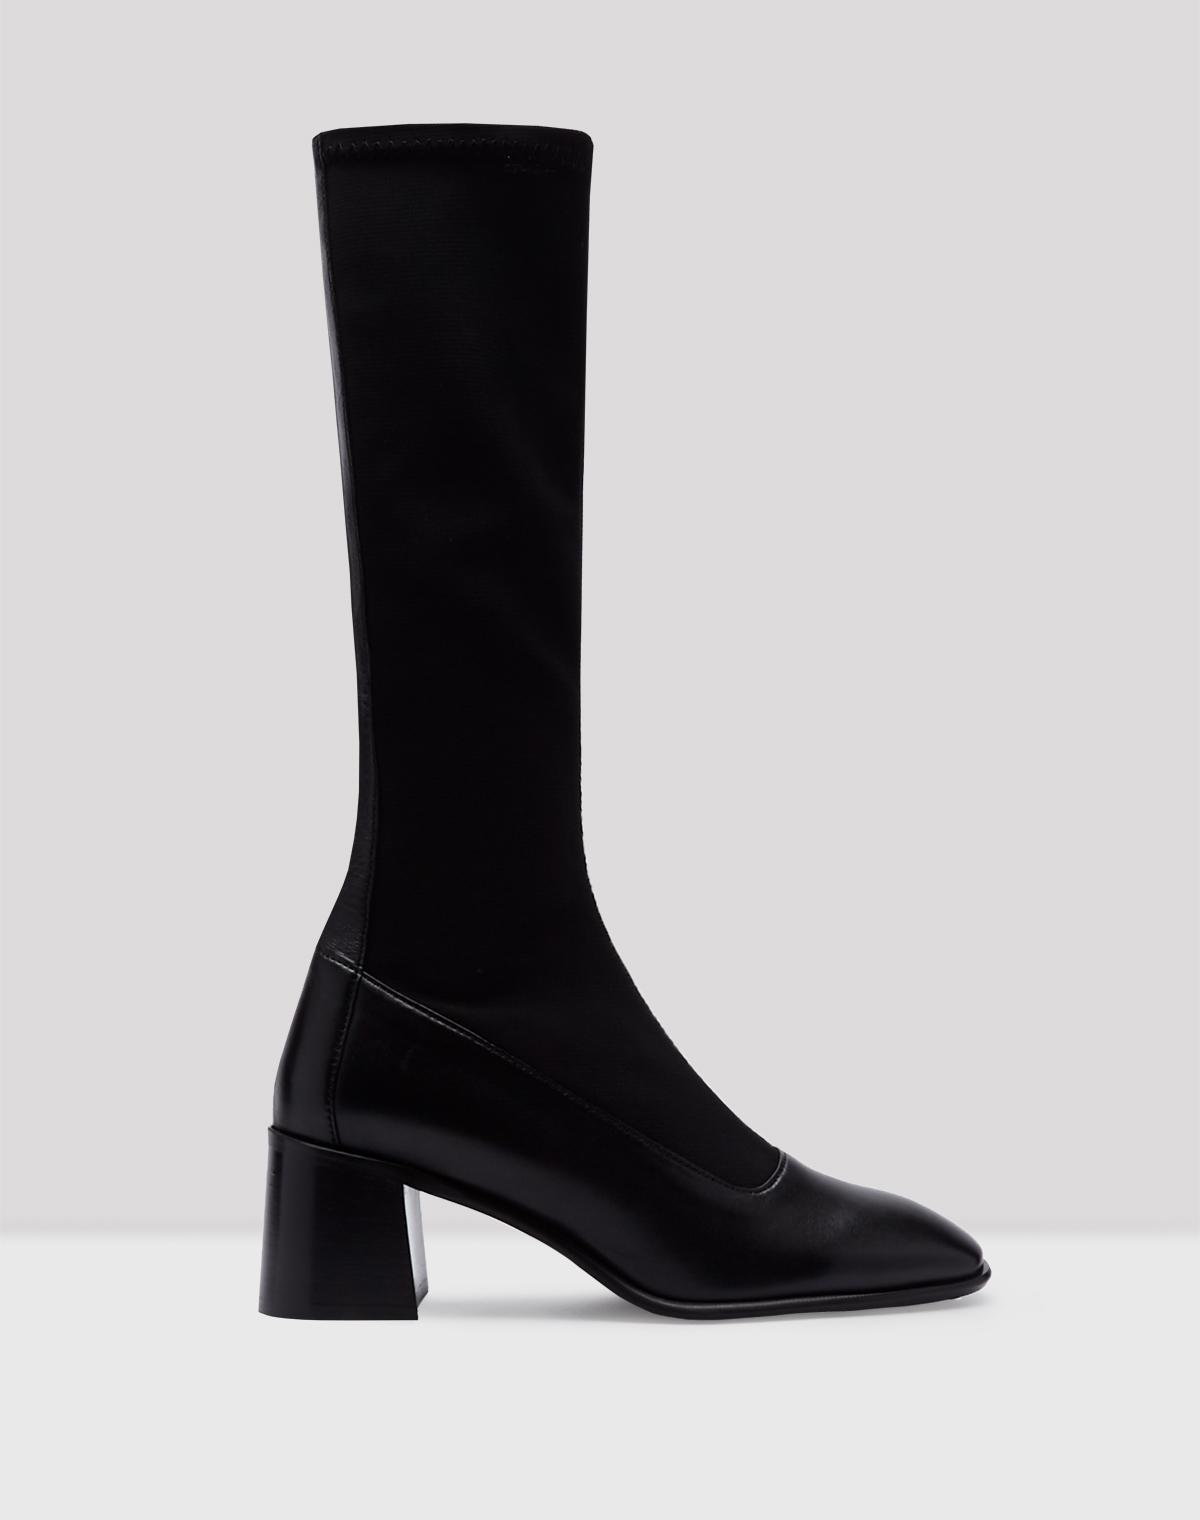 Alisa Black Stretch Leather Boots // E8